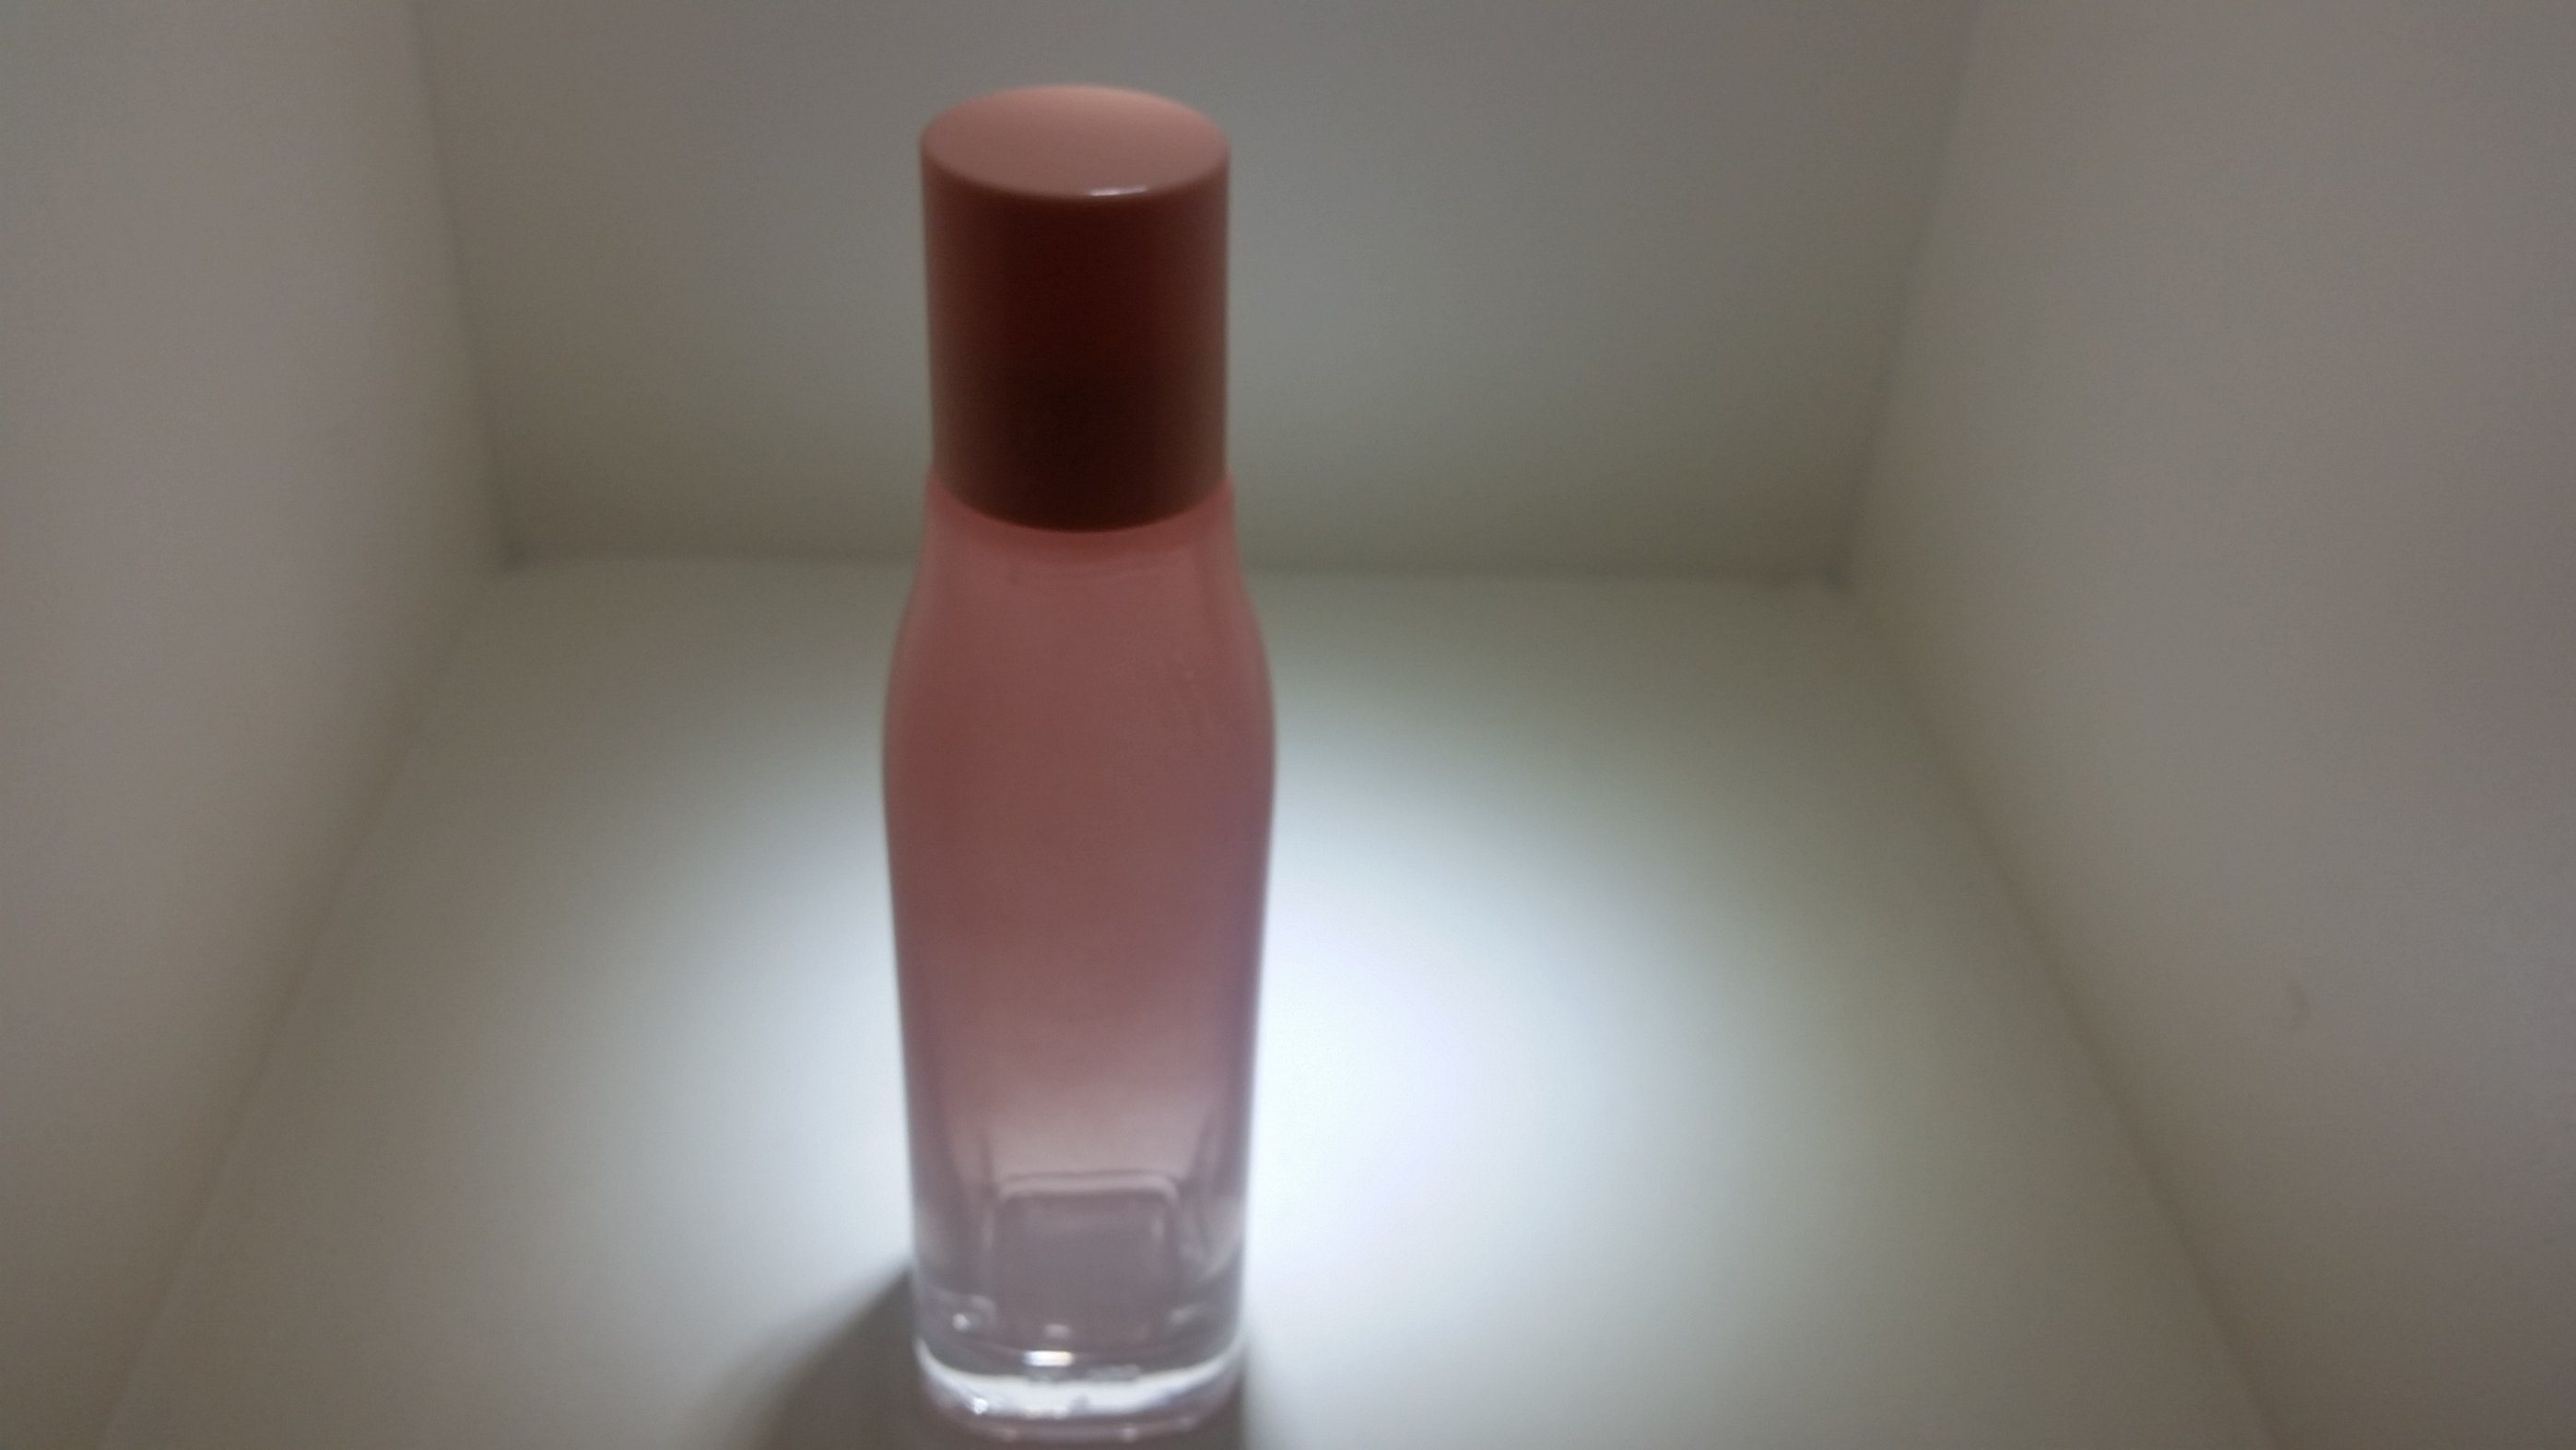 Qf-A3957 High Quality Glass Bottle